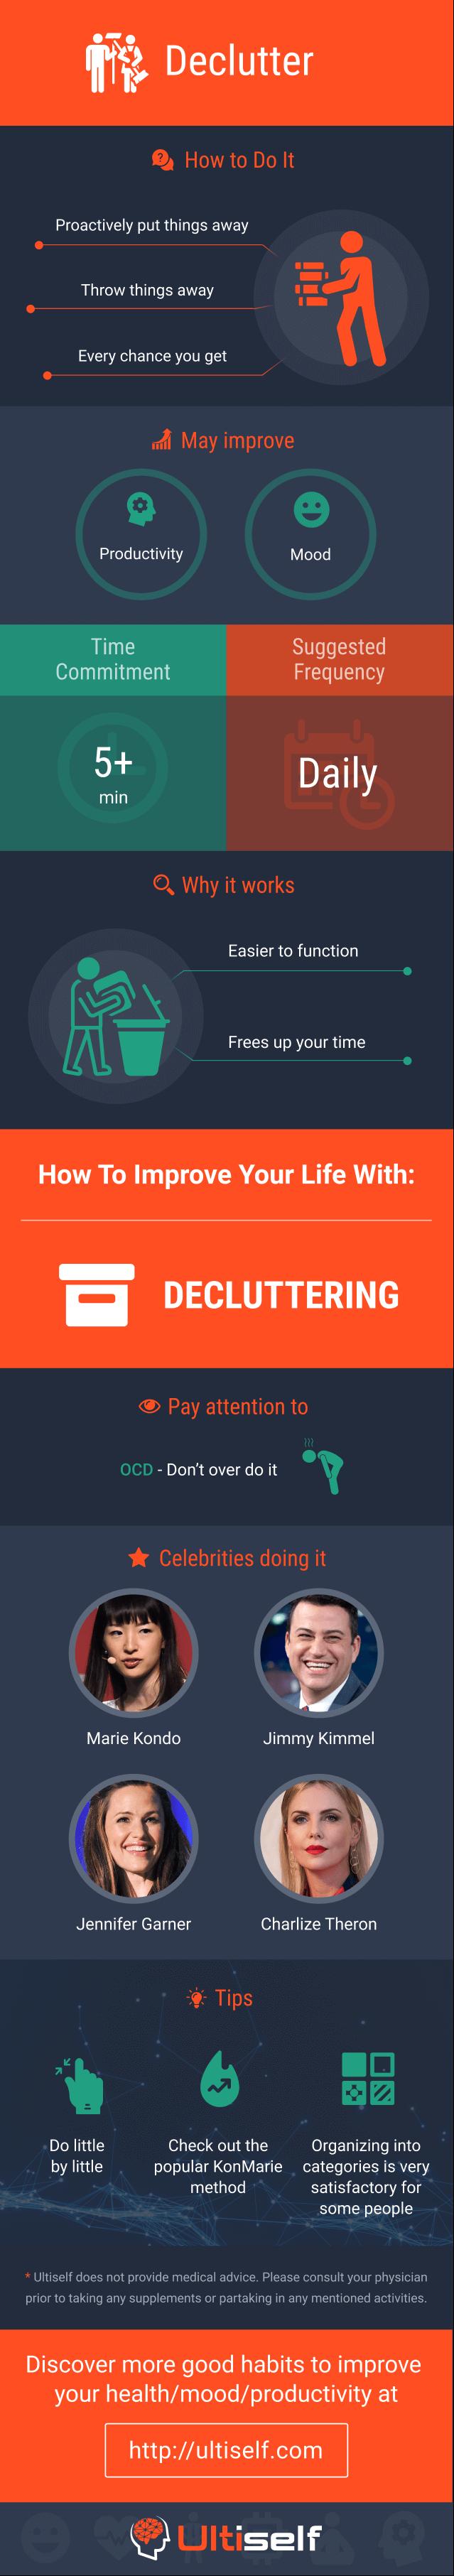 Declutter infographic